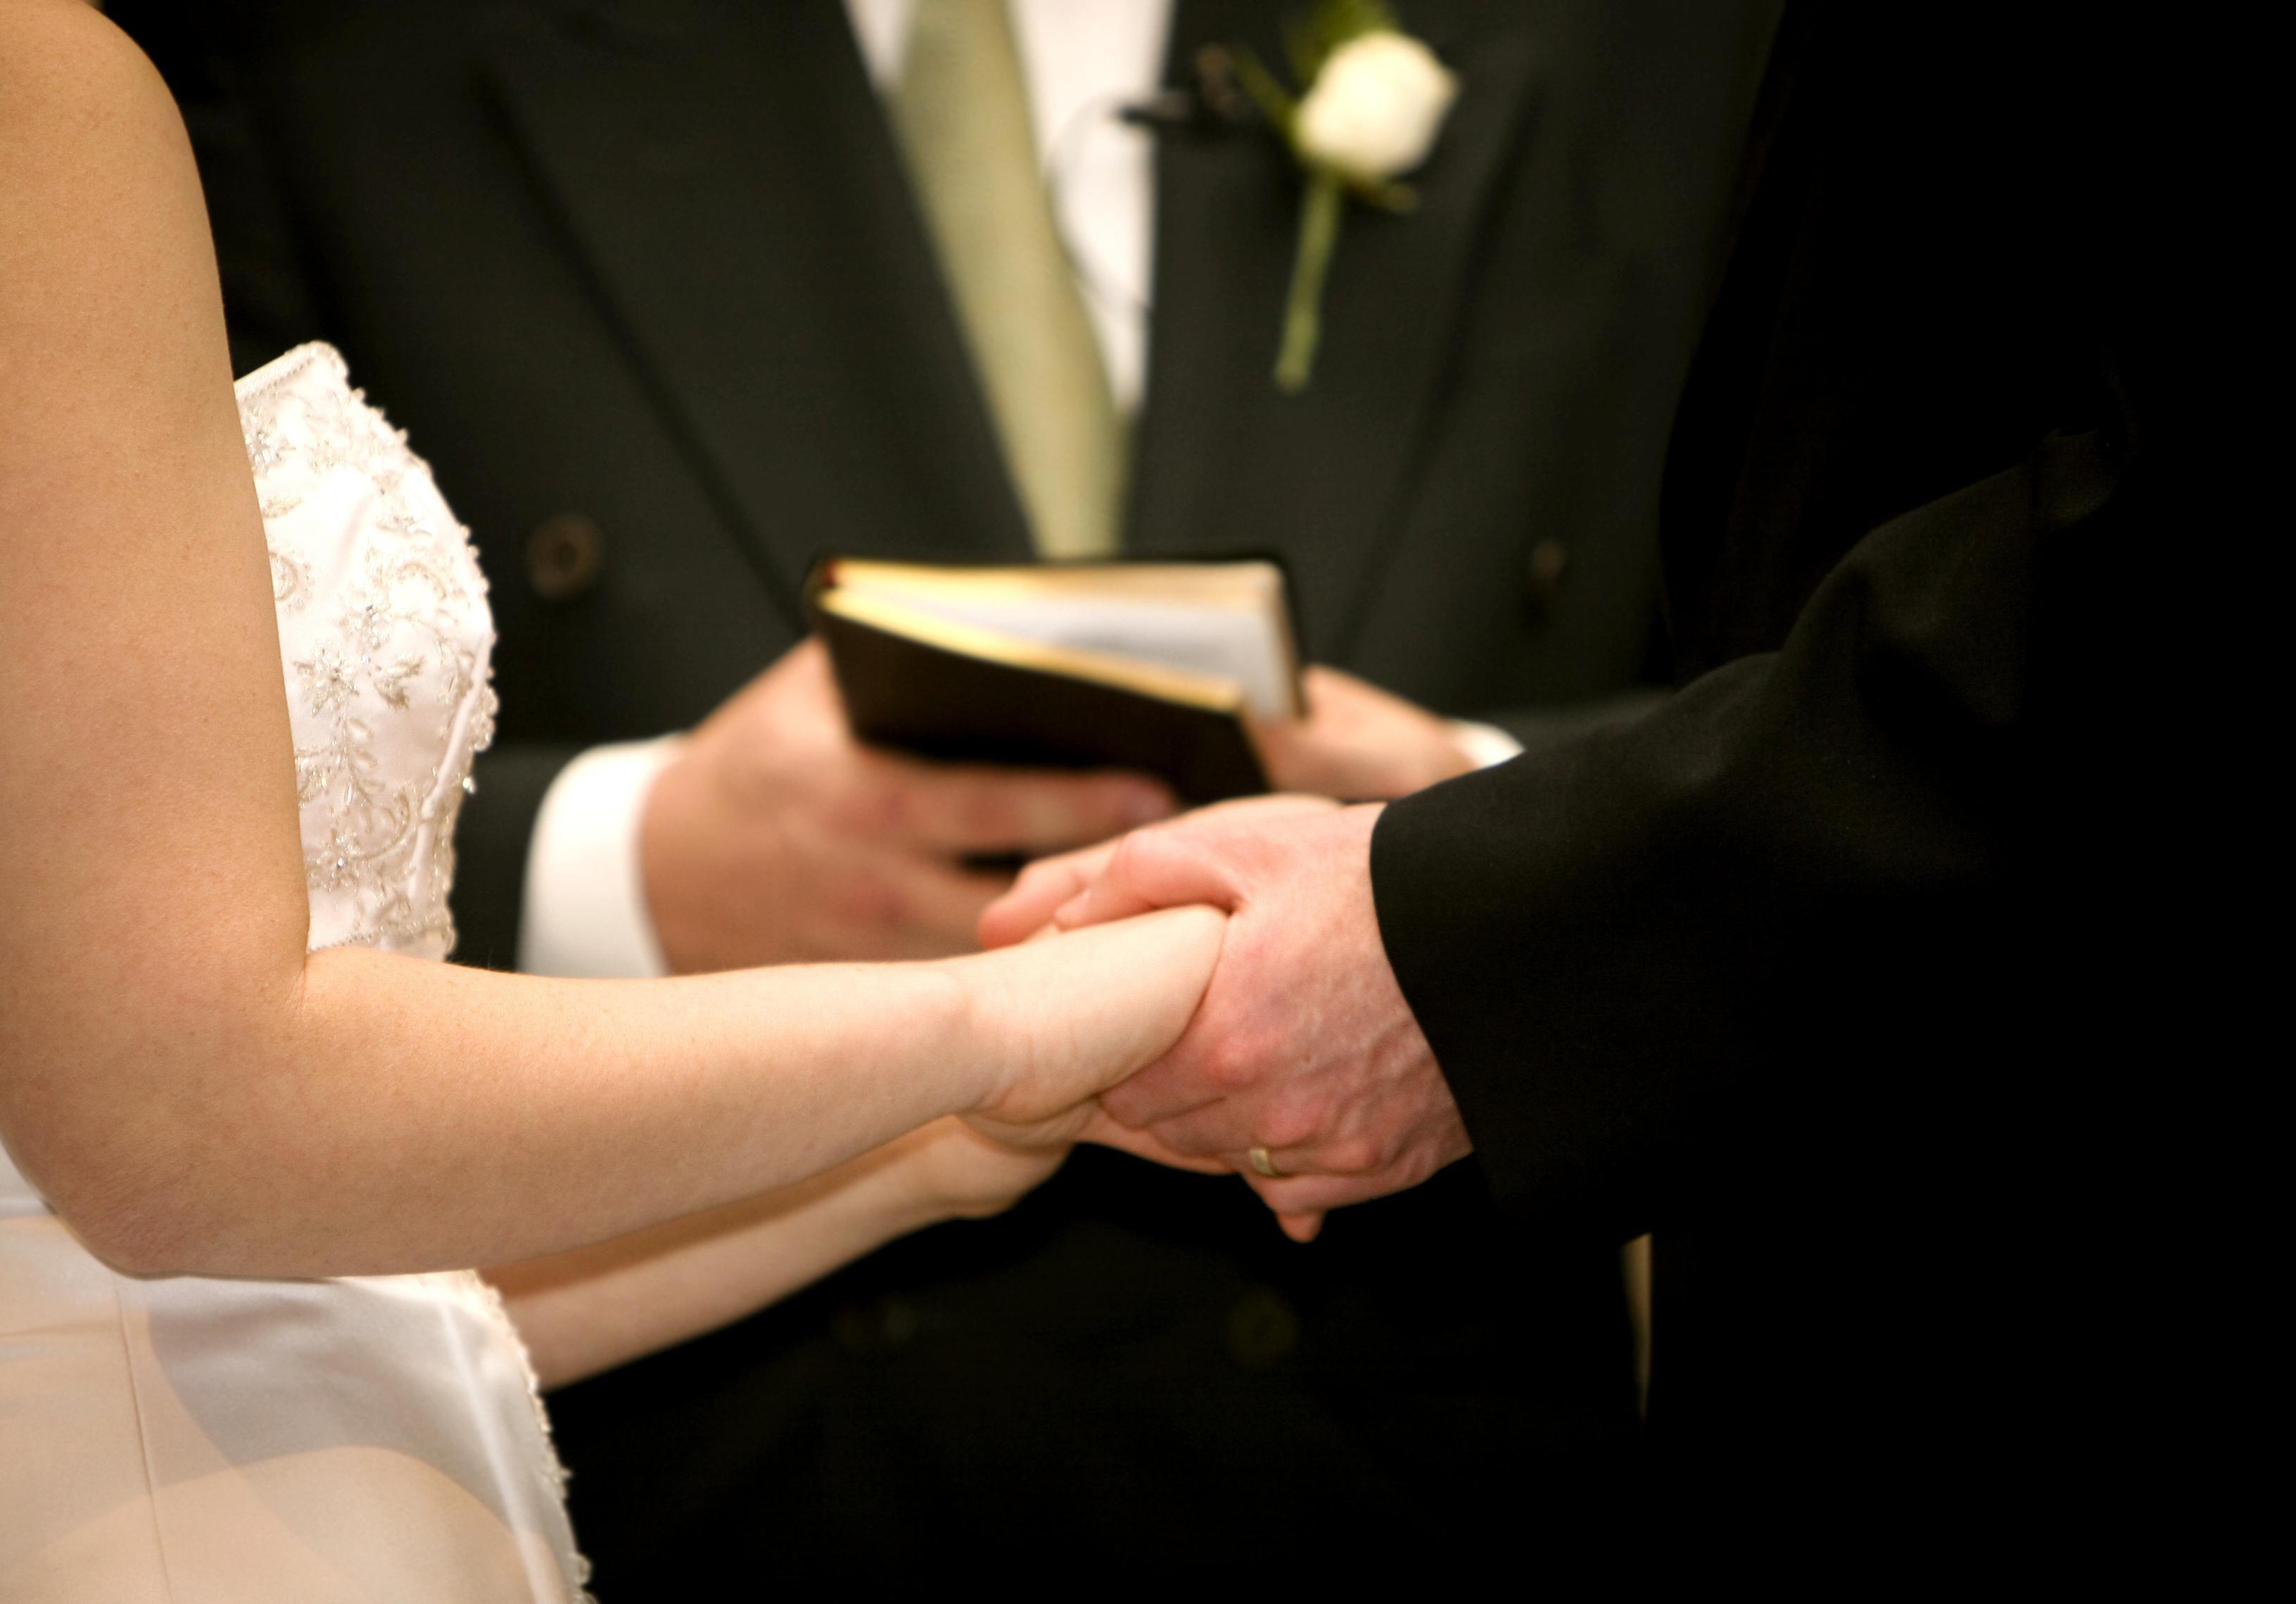 Ask wedding gift etiquette